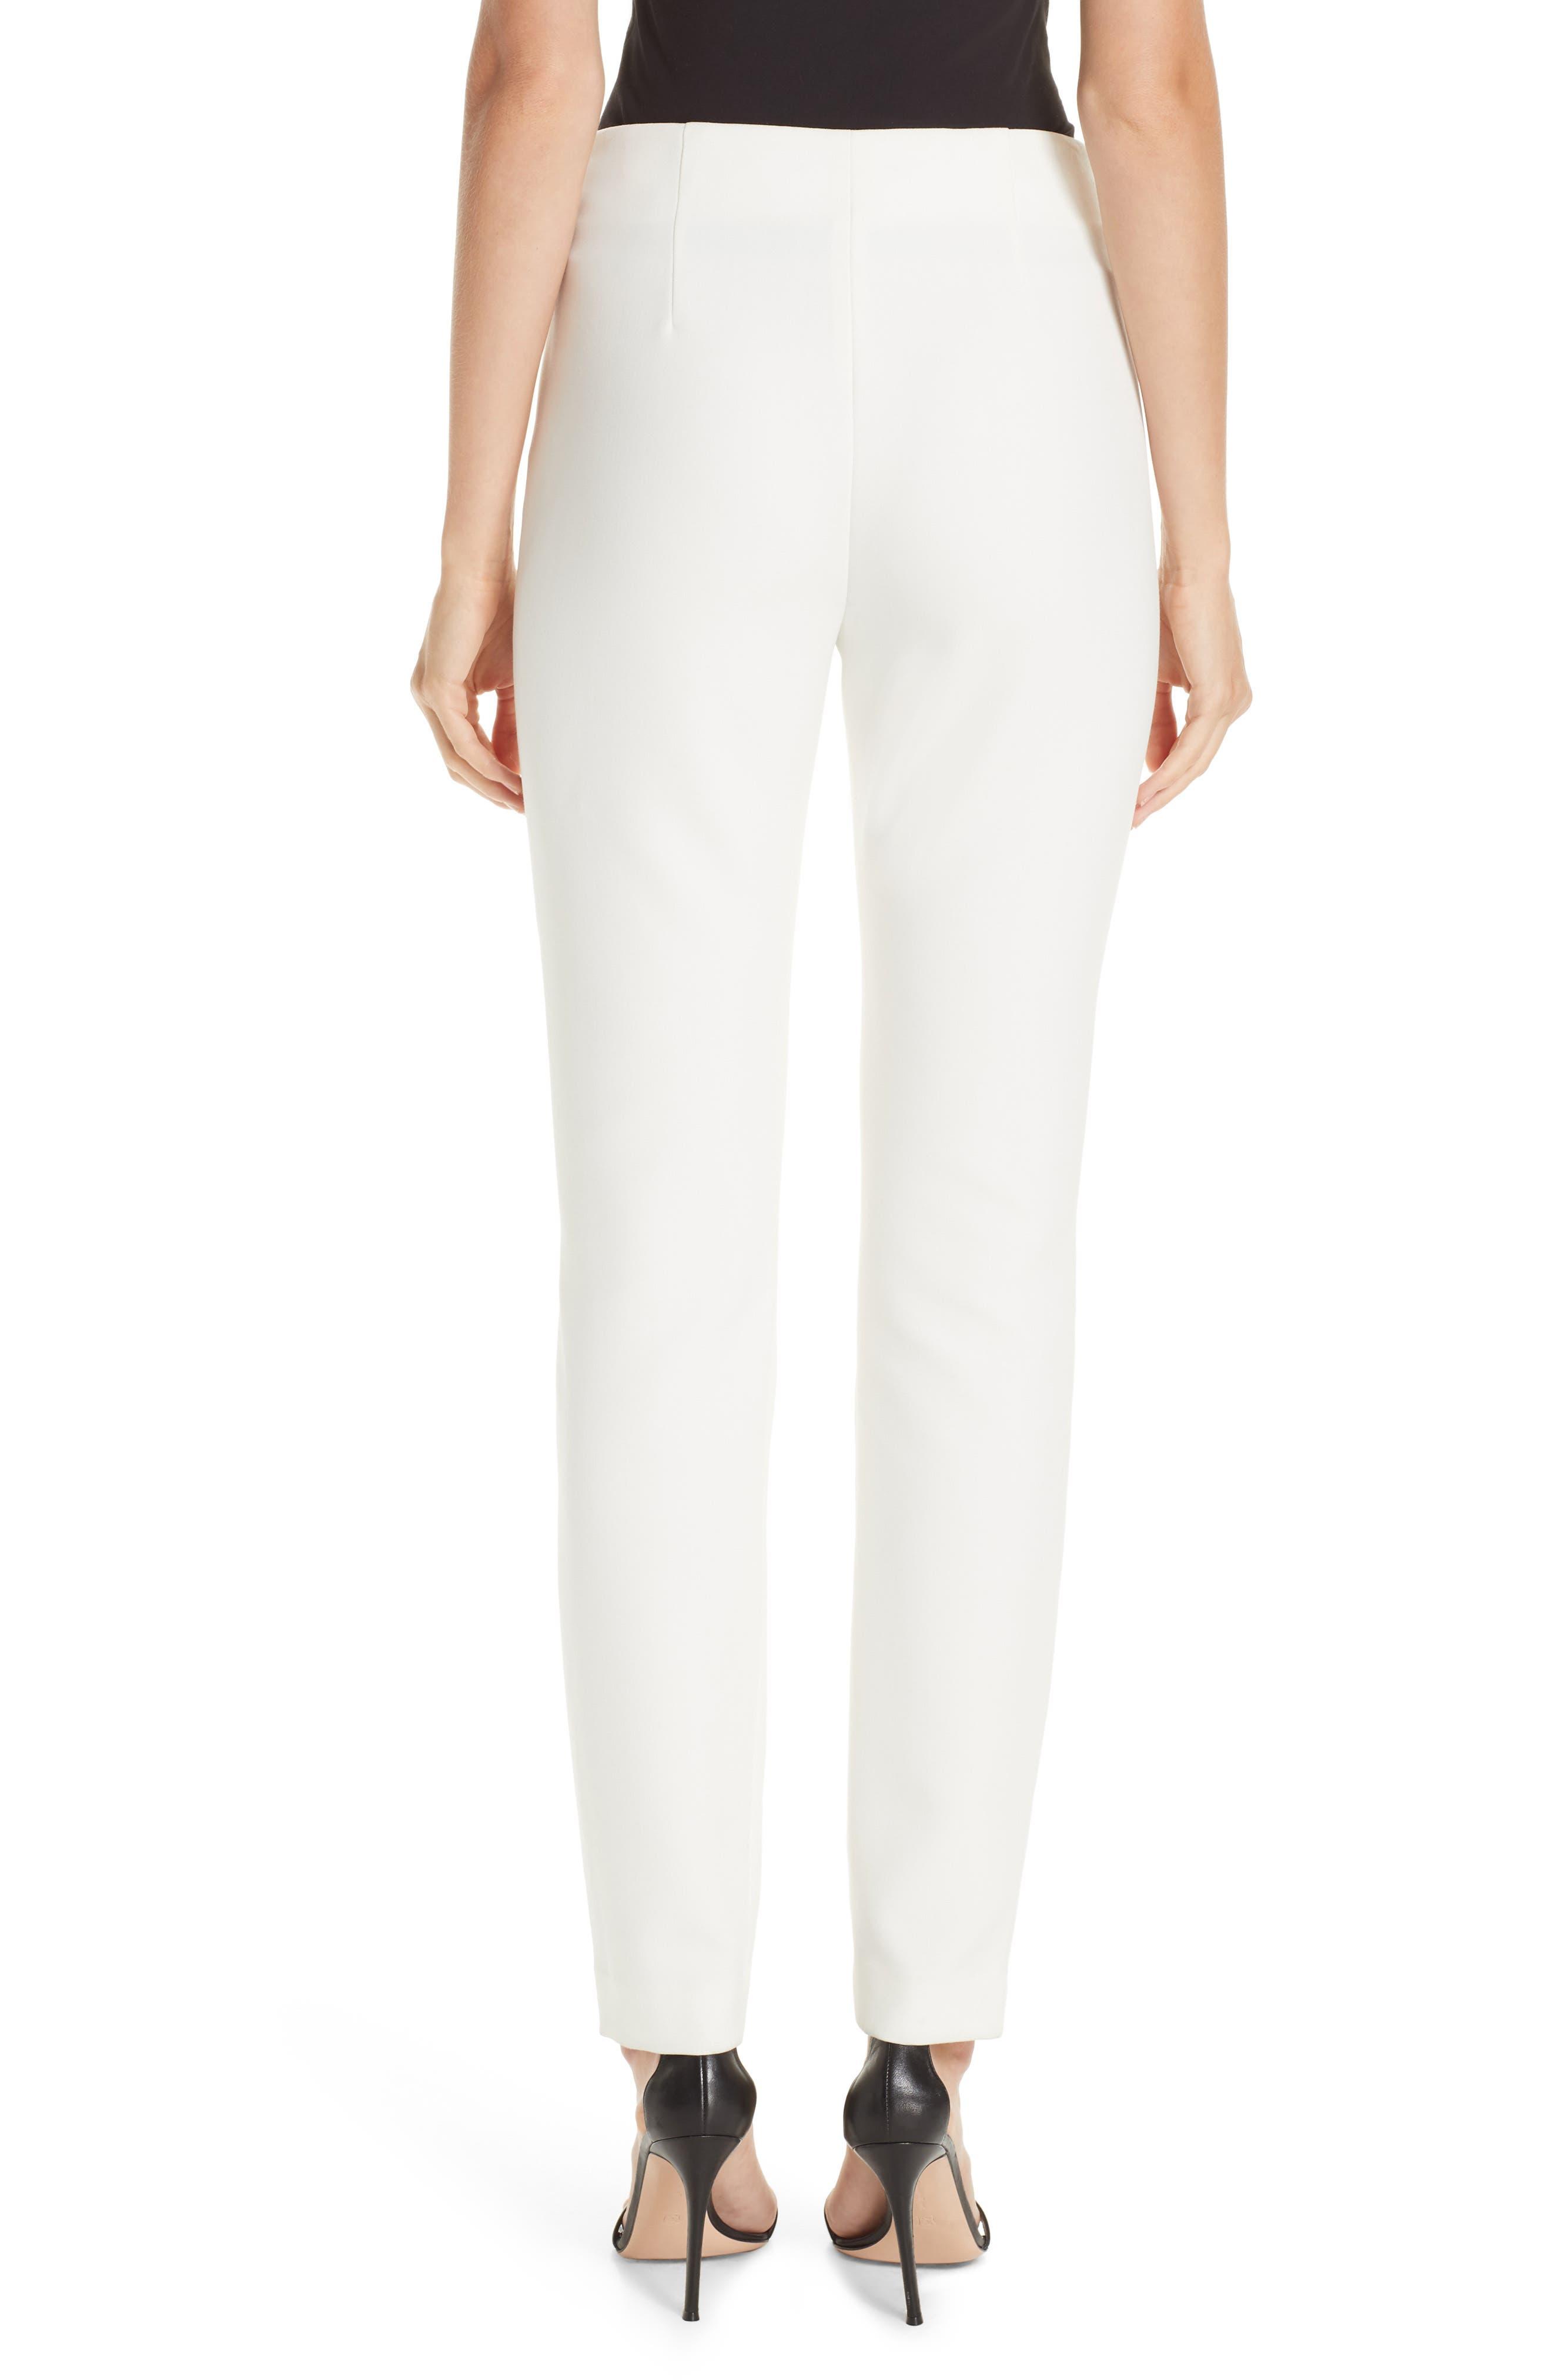 ST. JOHN COLLECTION, Bella Double Weave Skinny Pants, Alternate thumbnail 2, color, CREAM